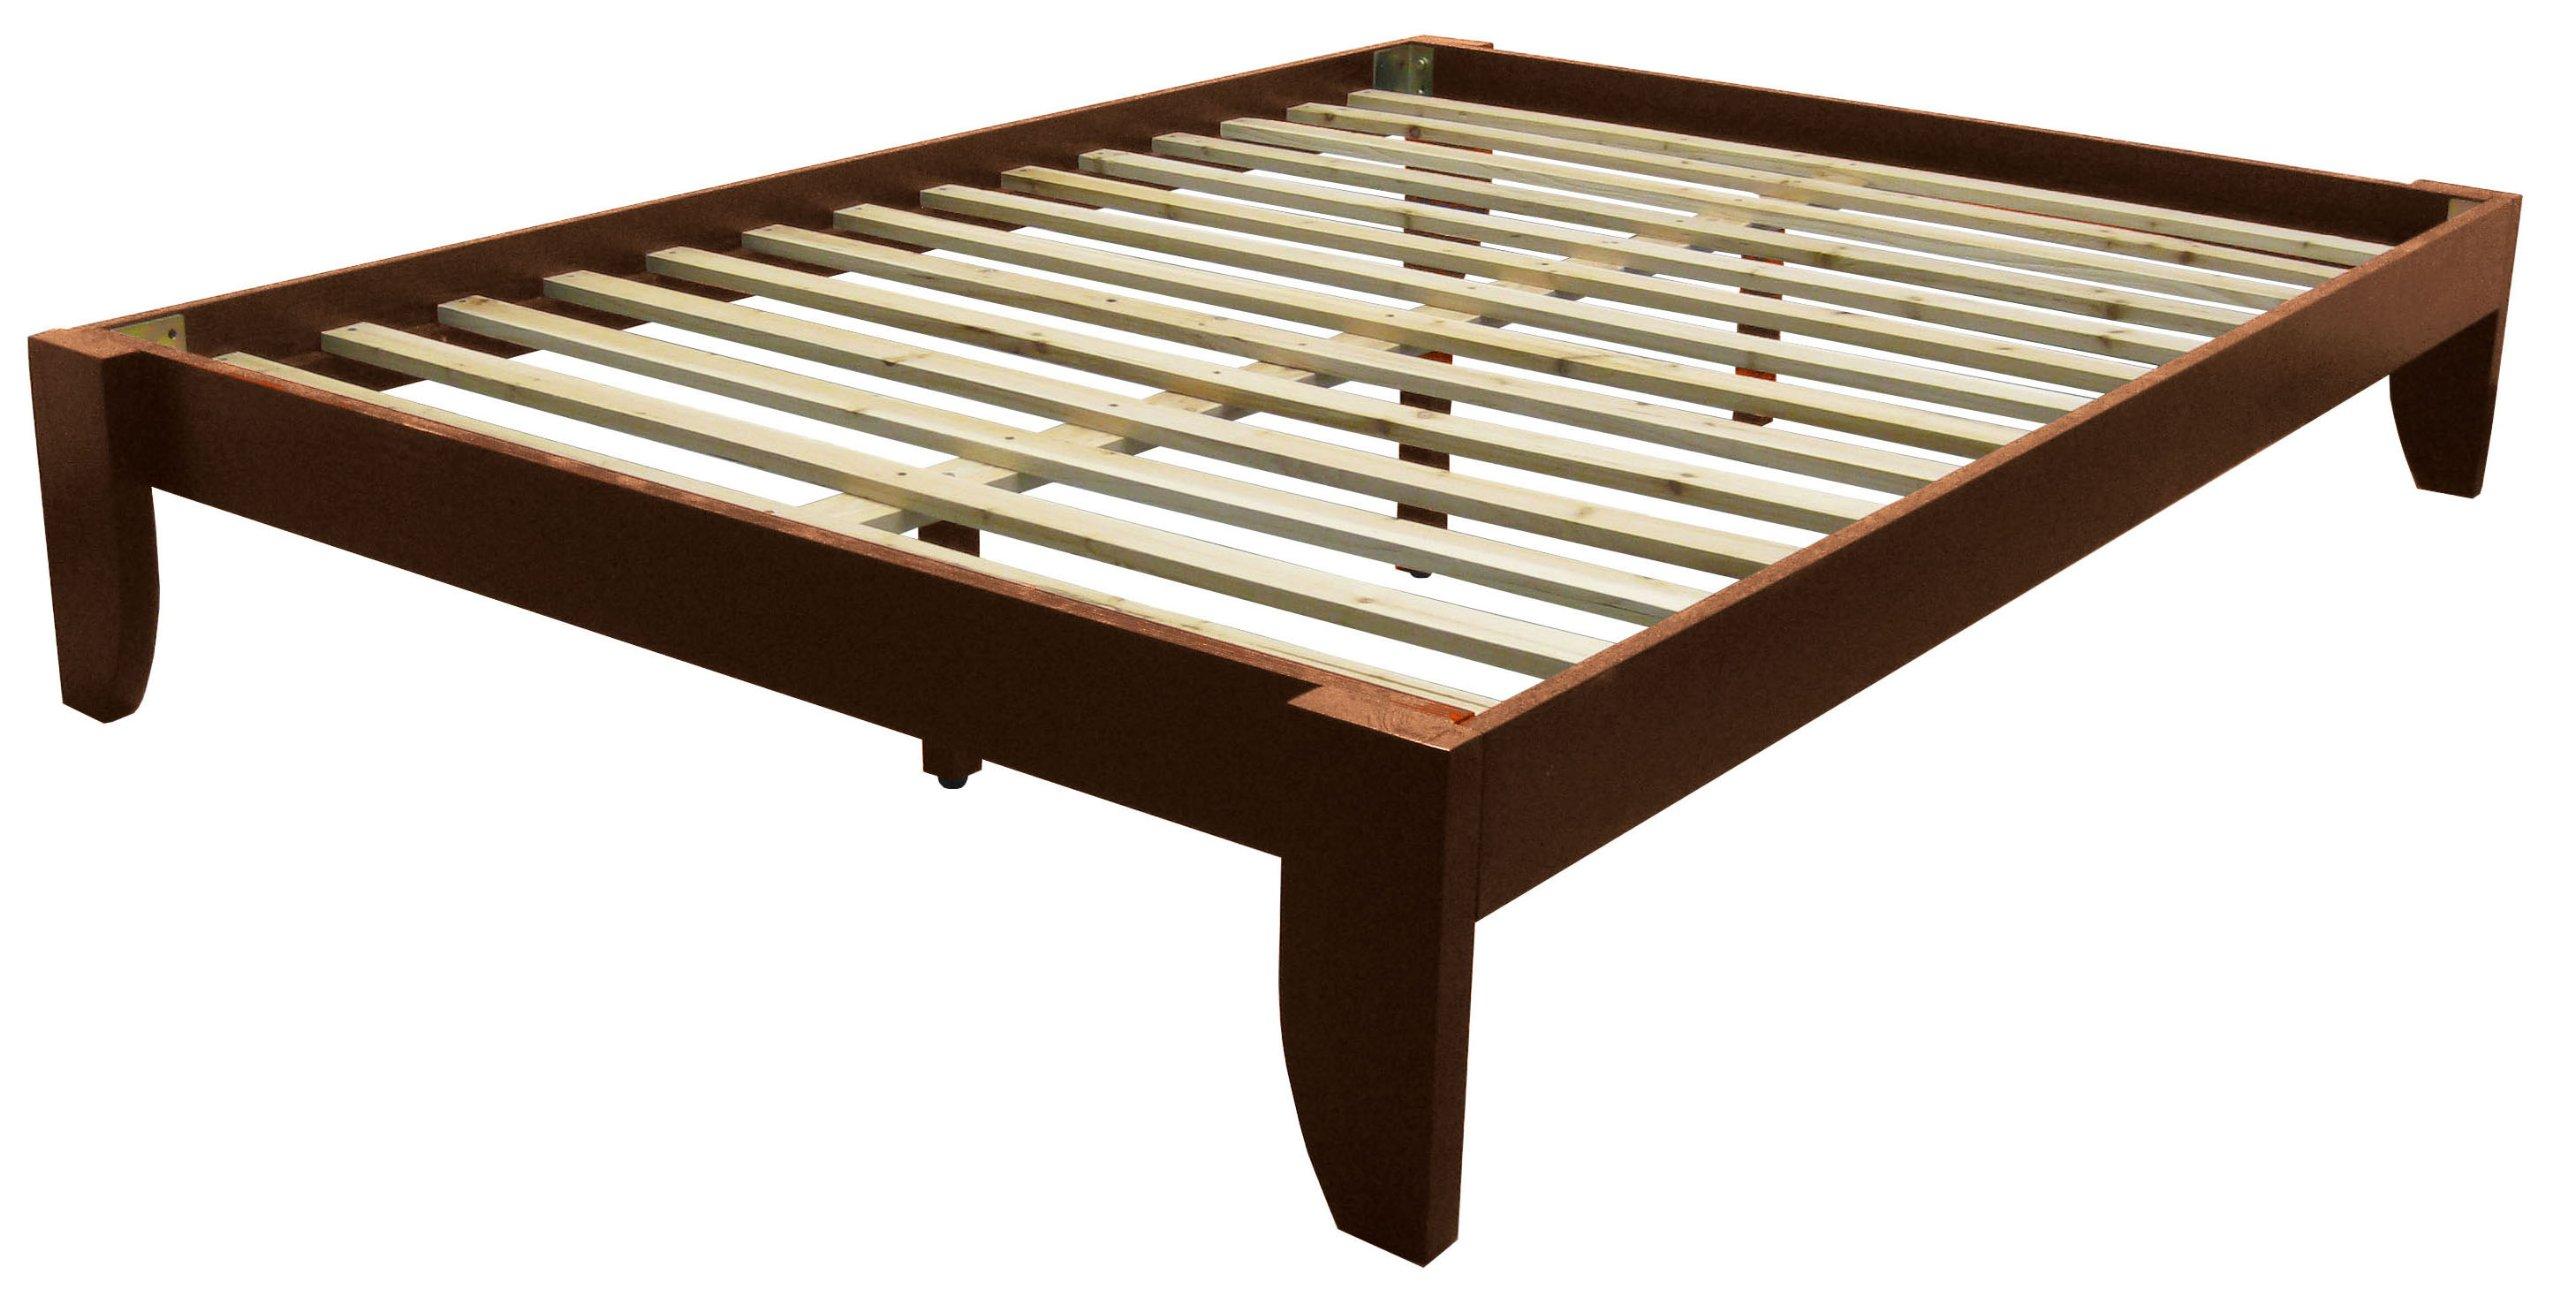 Copenhagen All Wood Platform Bed Frame, Queen, Walnut